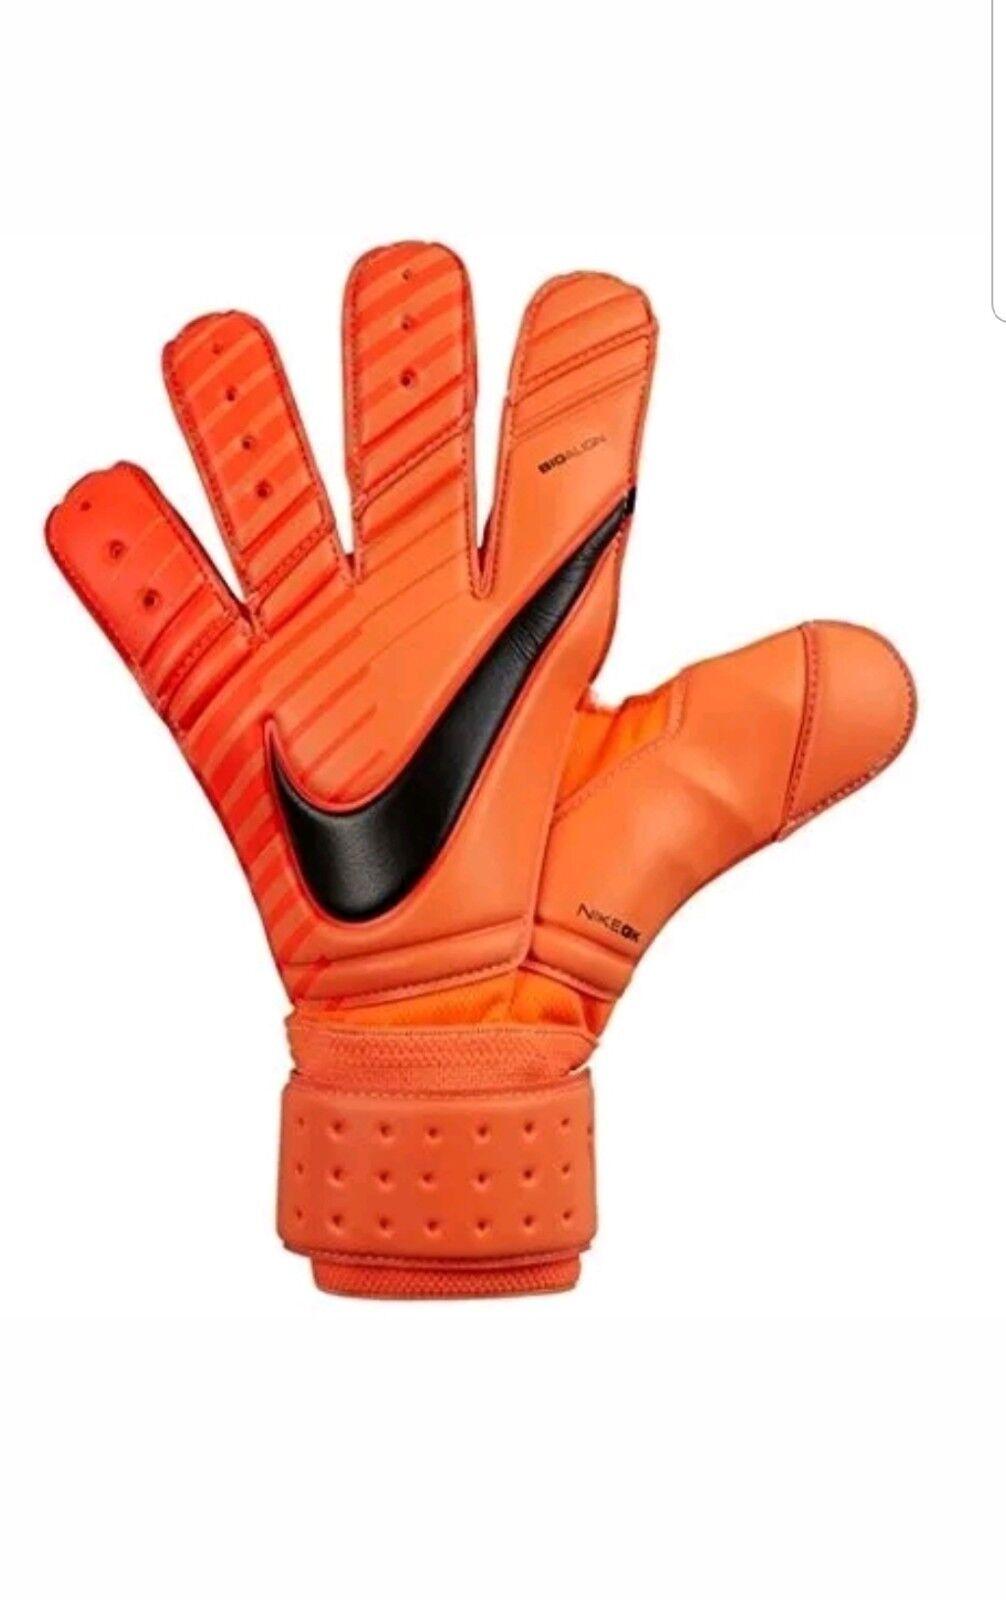 Nike Premier SGT gardien de but Gants Gants Gants (Total Orange/Hyper Crimson) (9) bee7d1